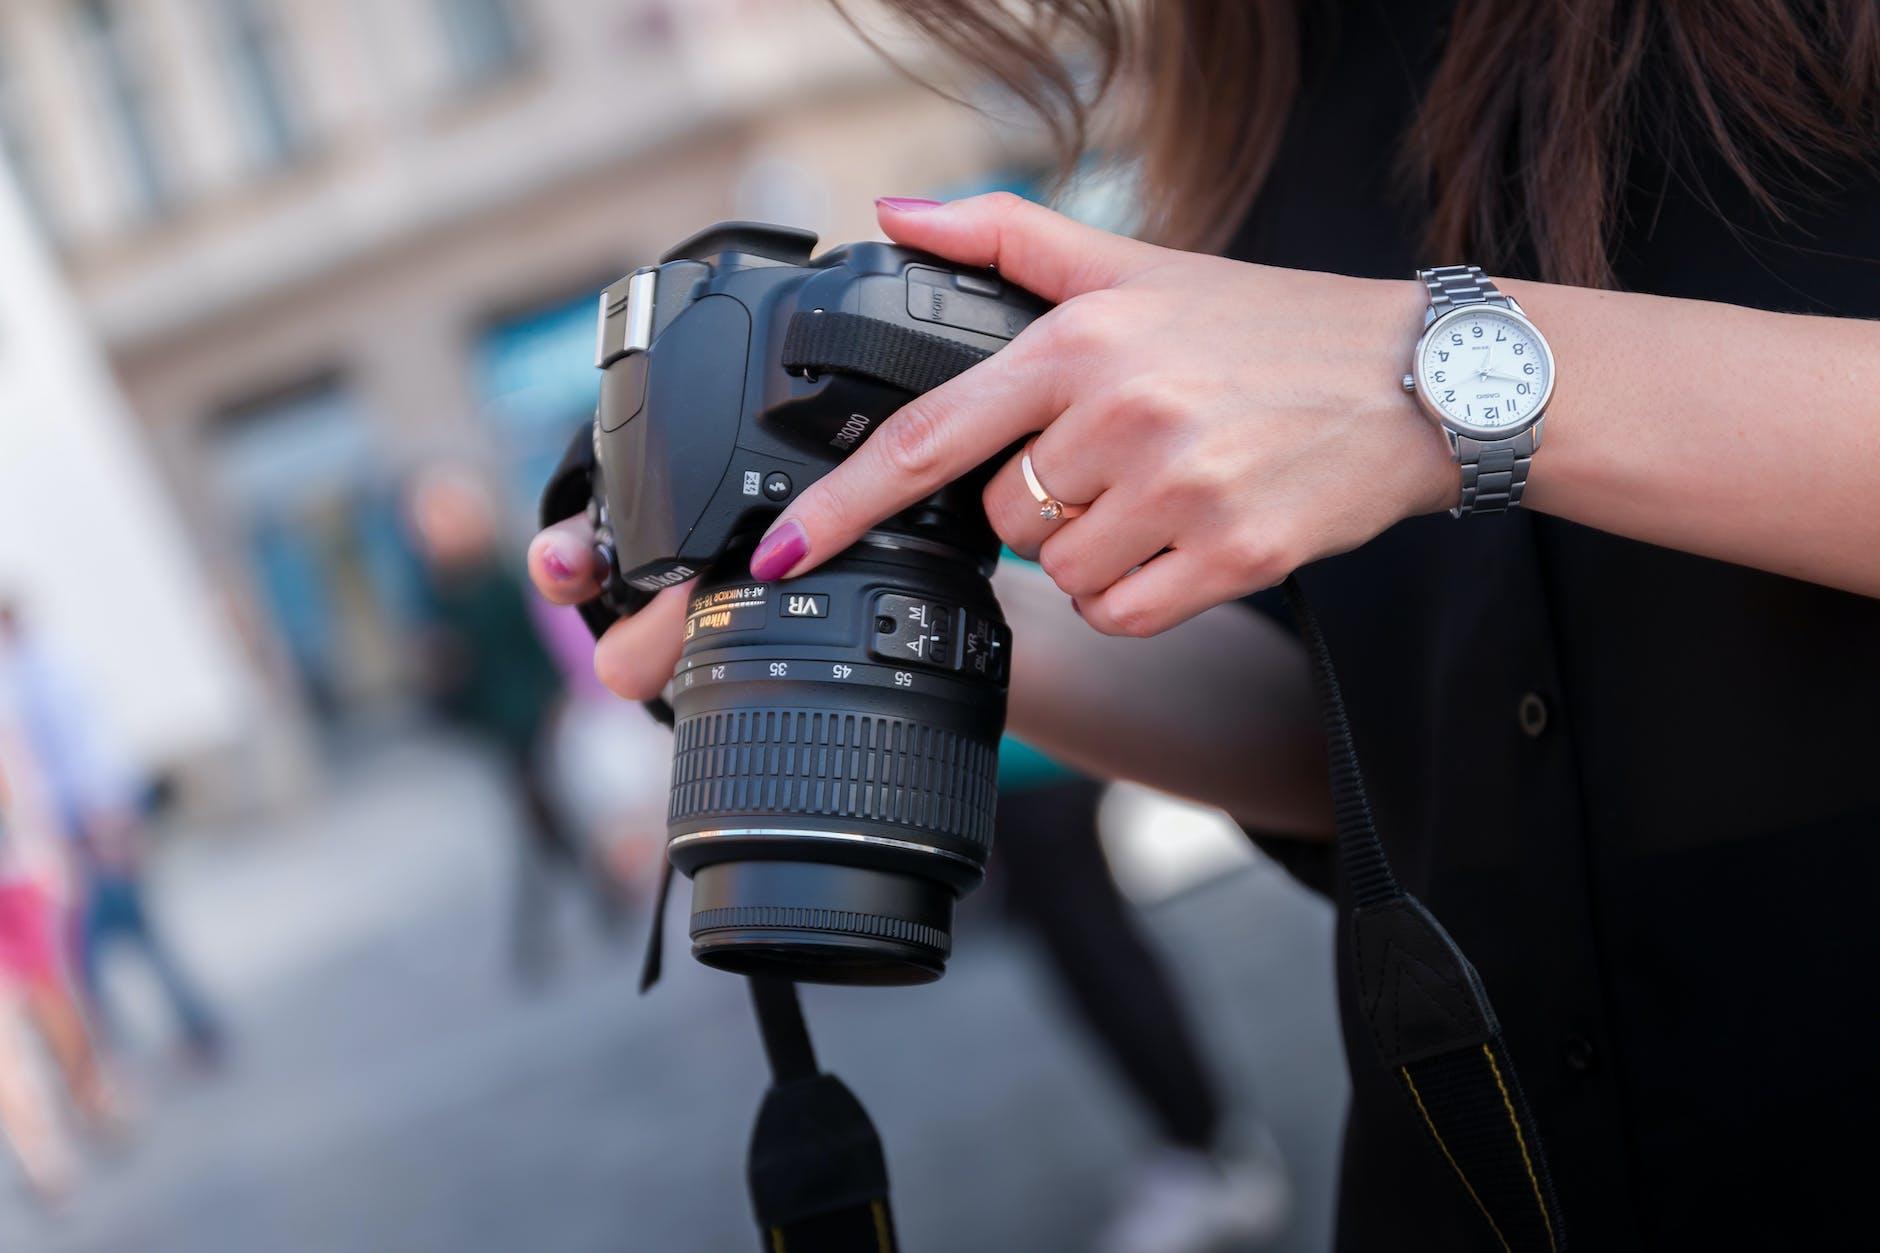 Wristwatch, Silver, Steel Watch, Wristwatch, Camera